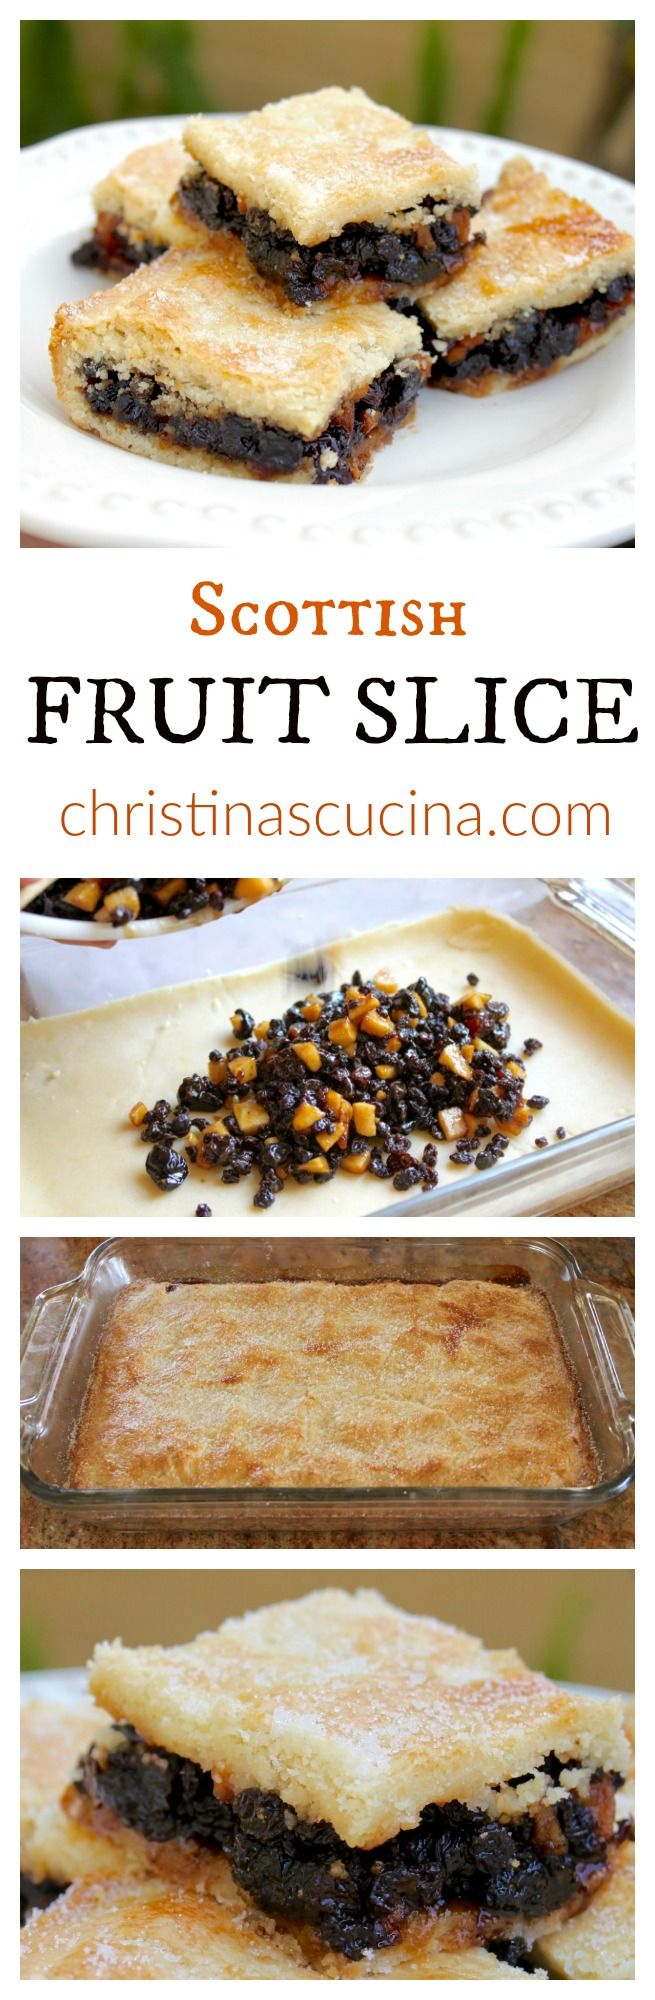 Scottish Fruit Slice recipe